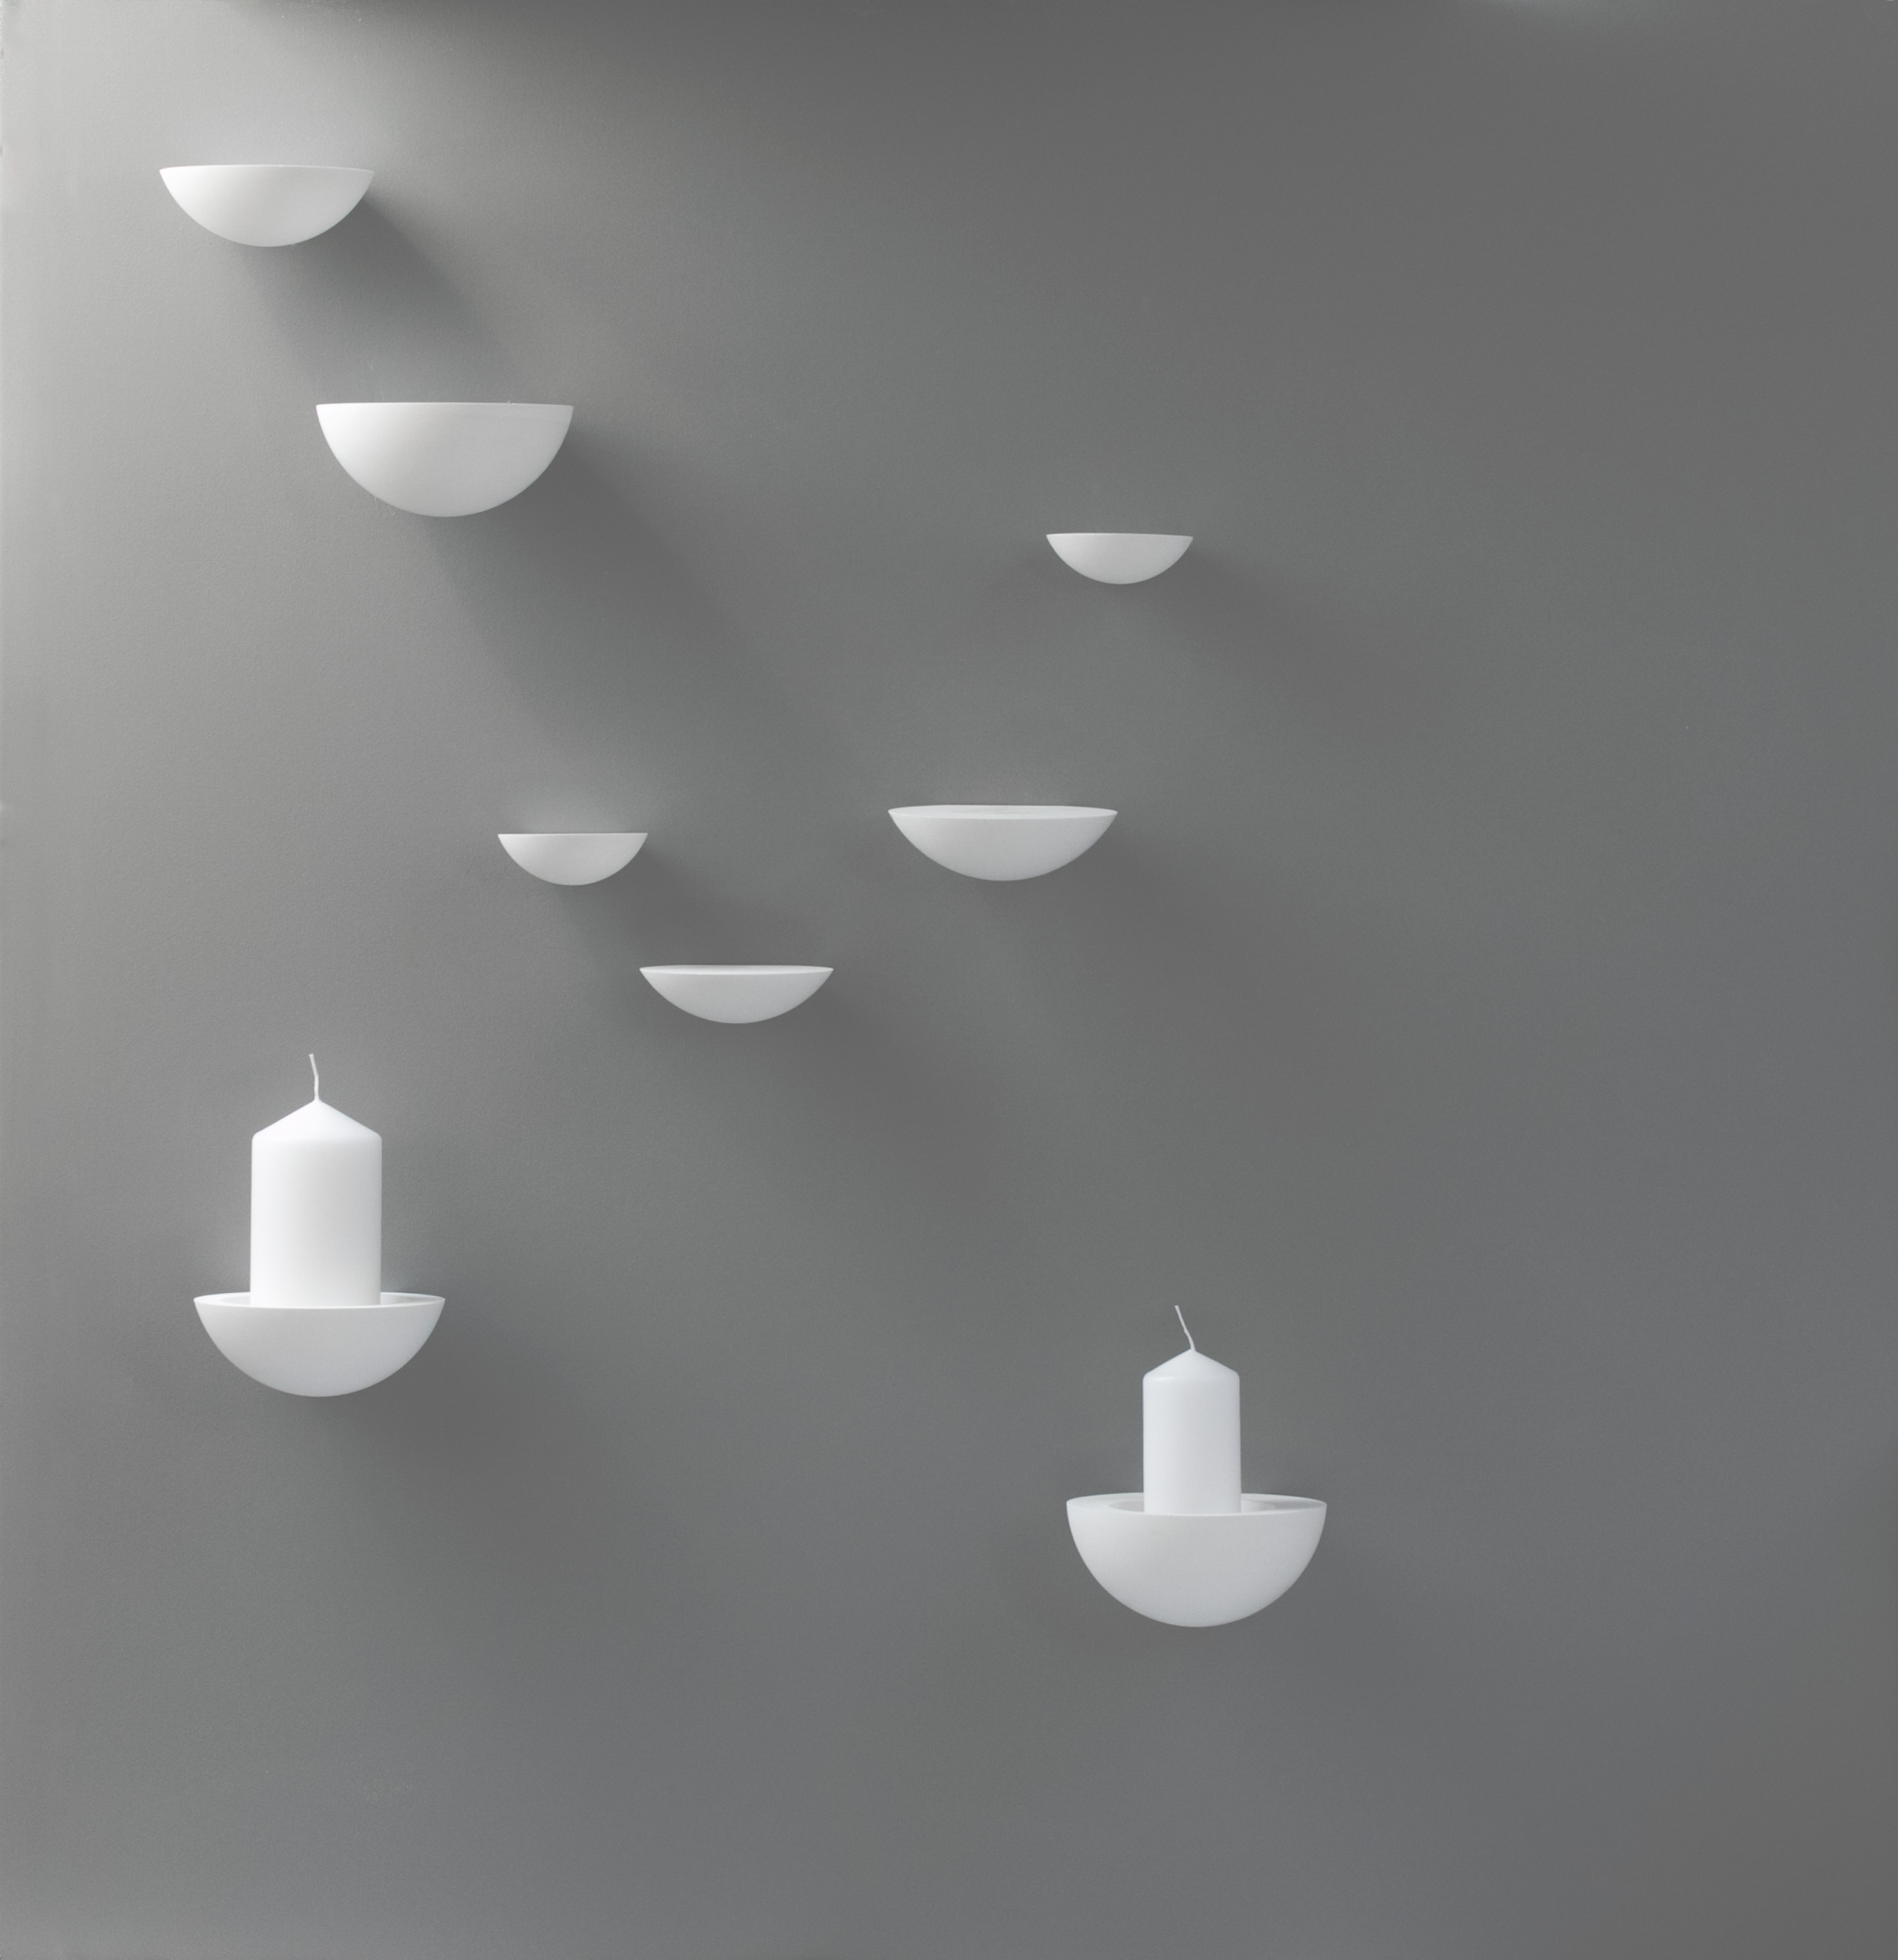 poast candleholder